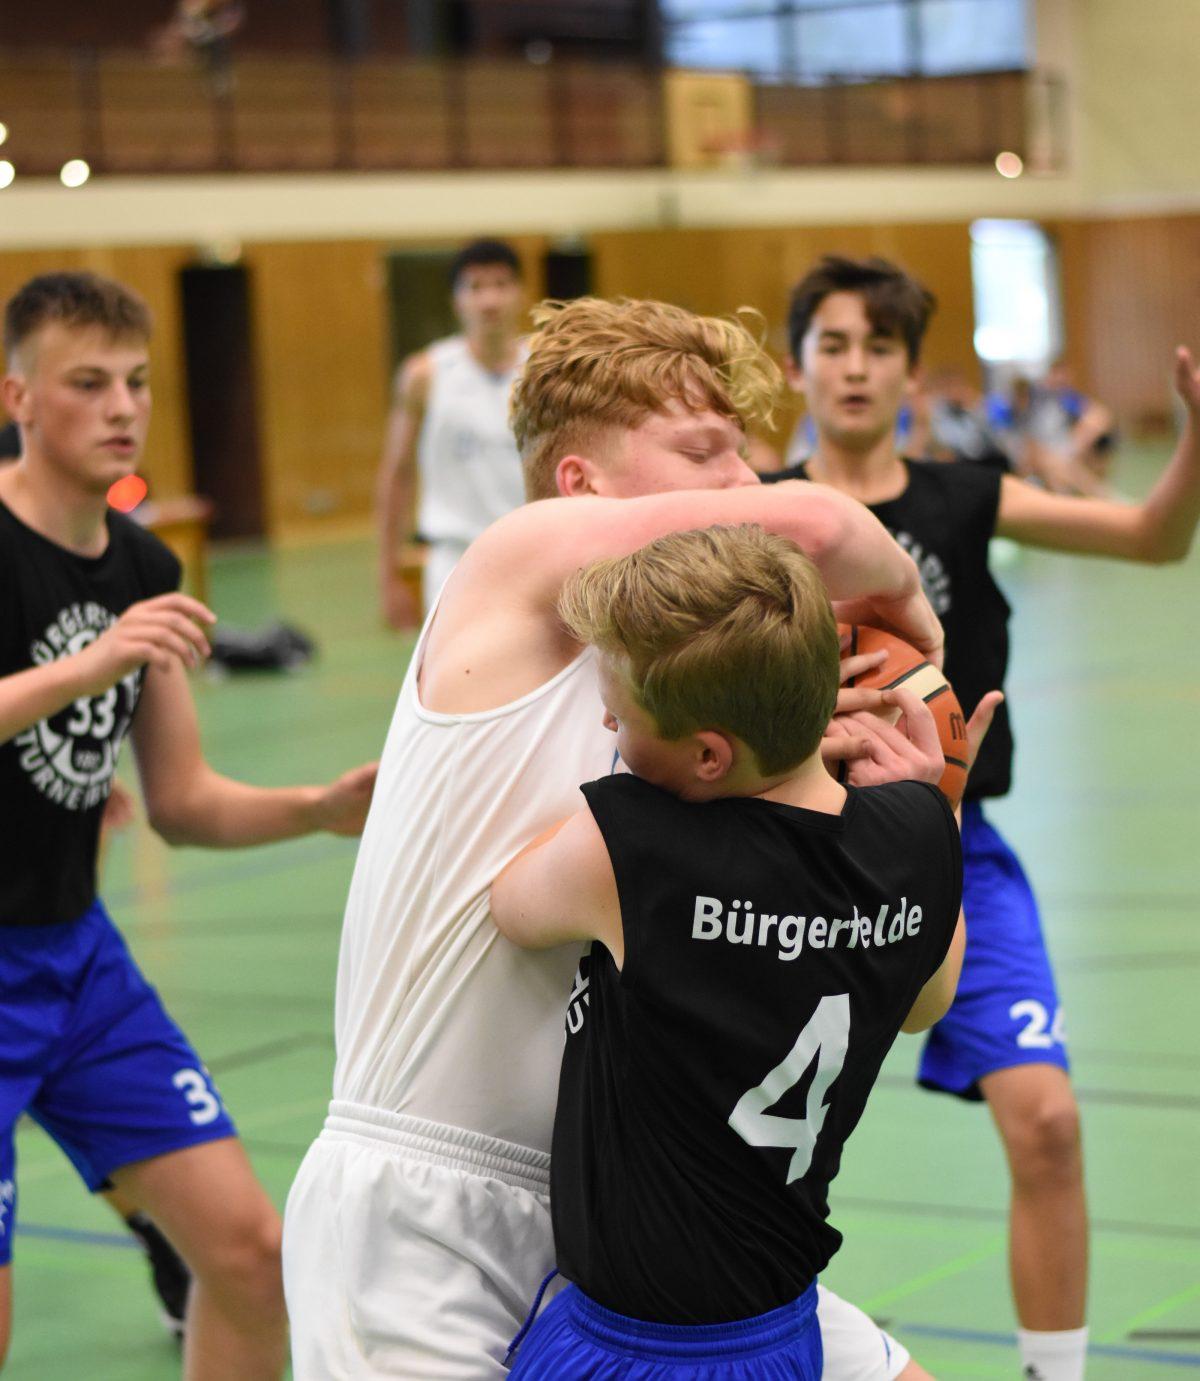 133:29 – U18 deklassiert Bürgerfelde zum Saisonauftakt